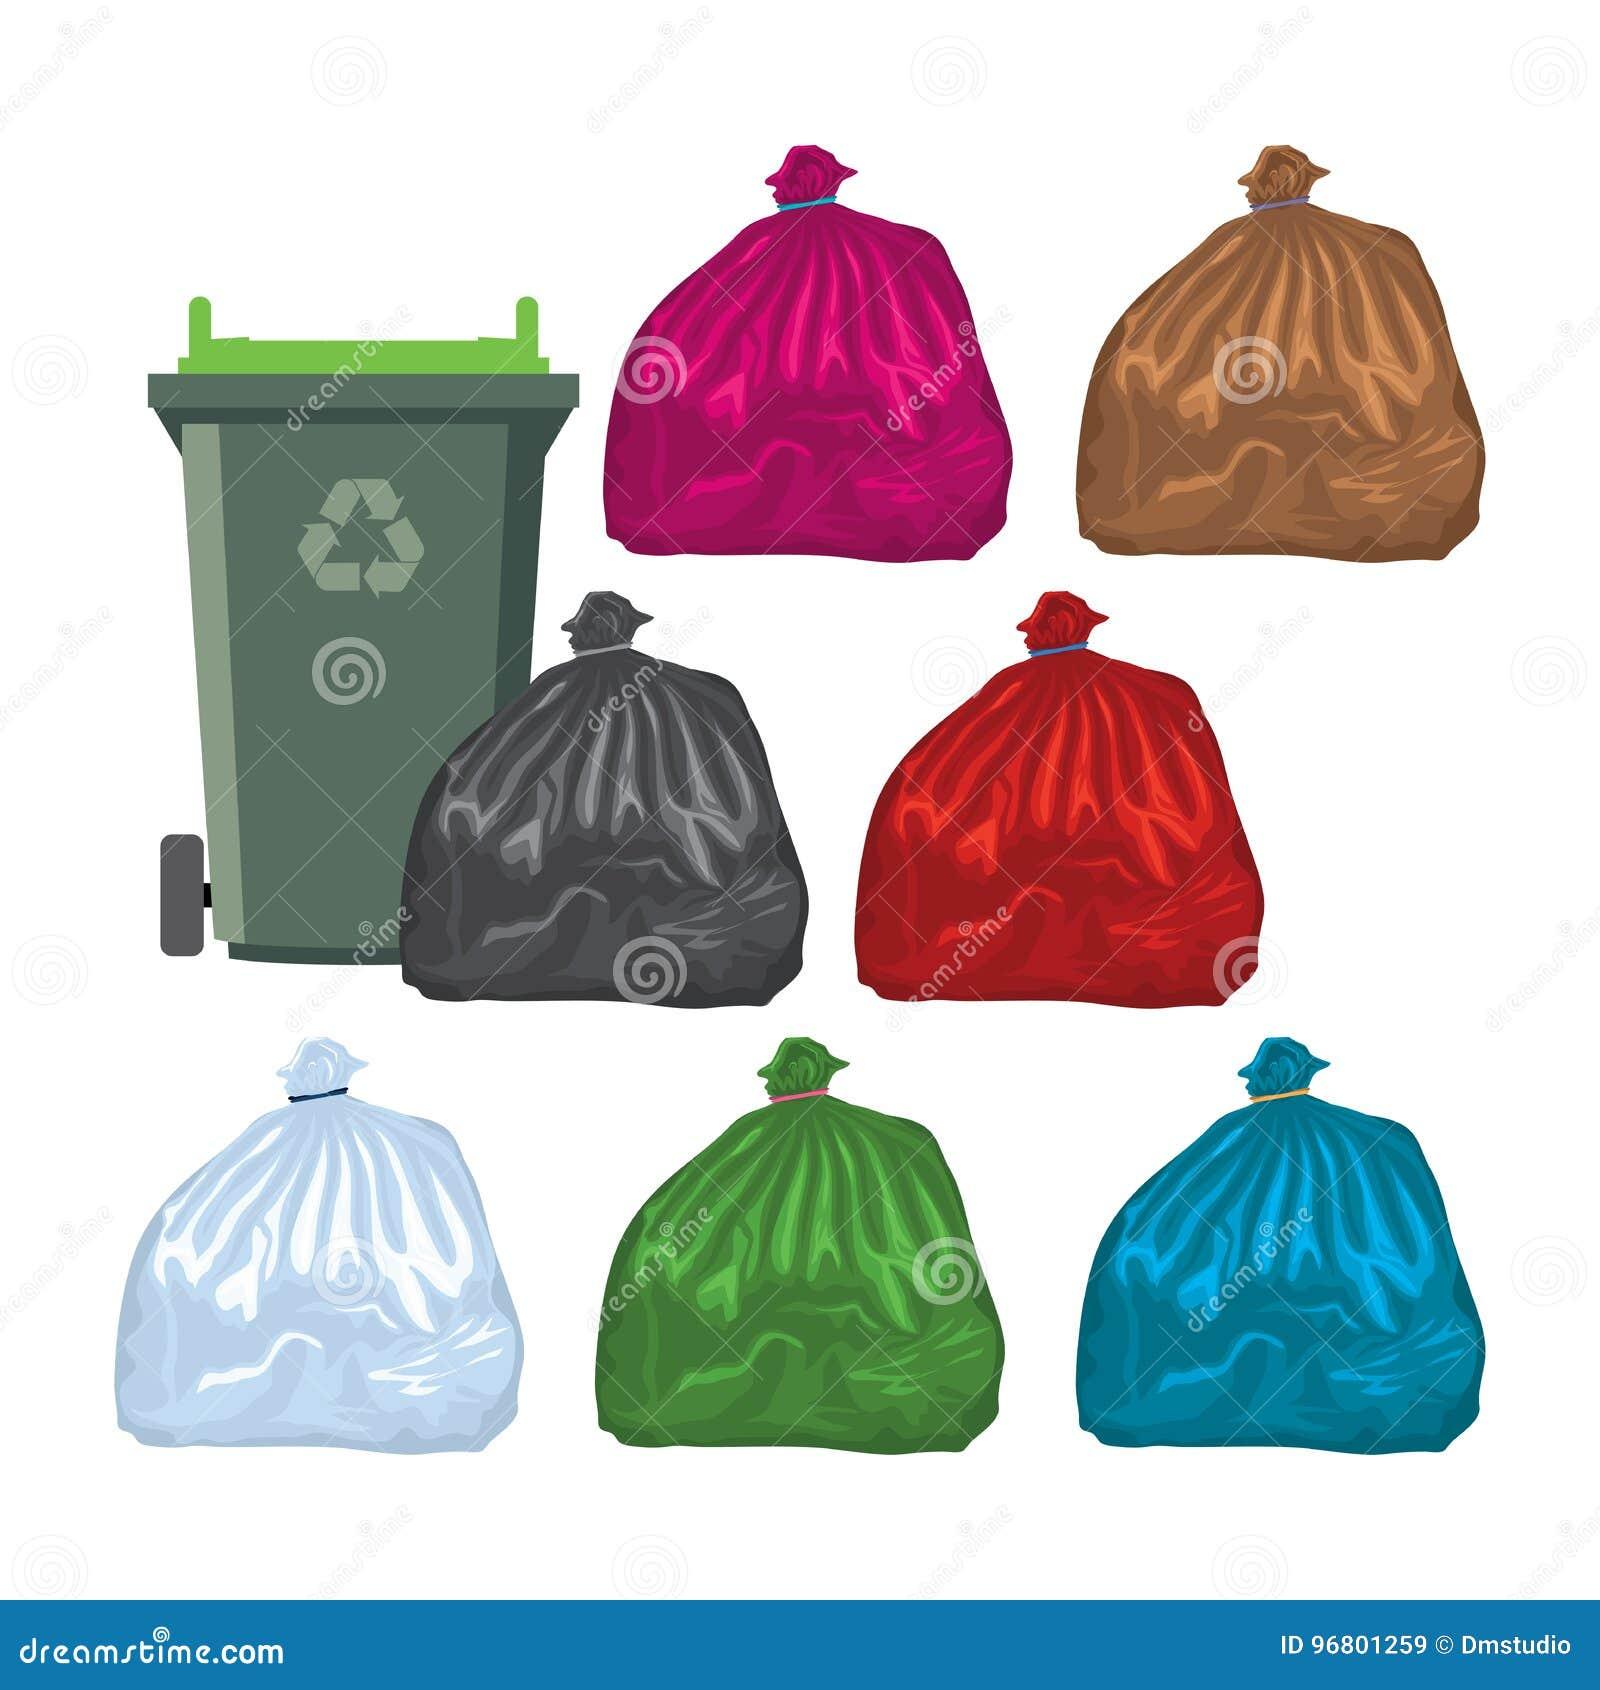 Vlakke recyclings wheelie bak met vuilniszakken